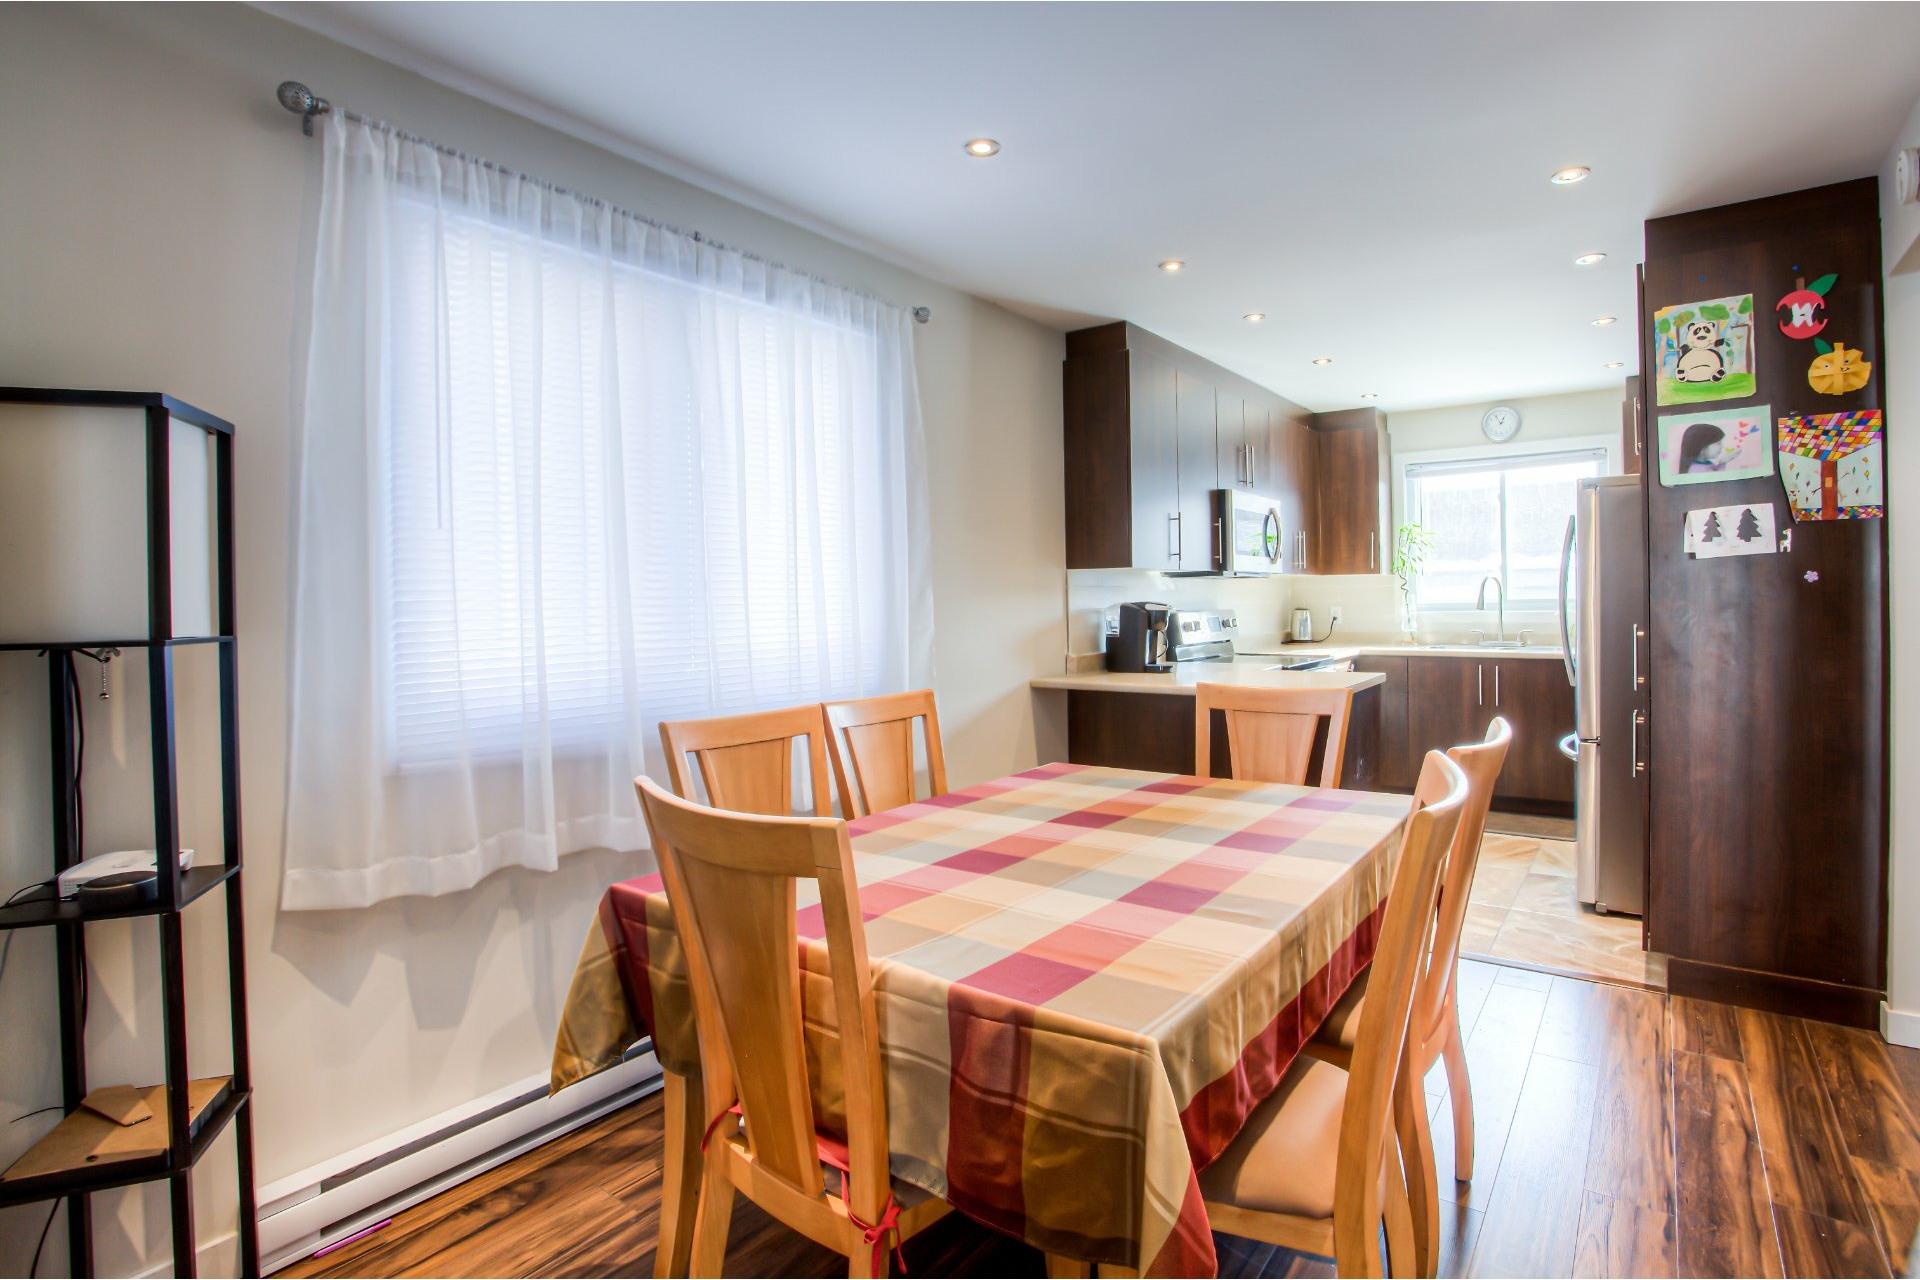 image 9 - House For rent Pierrefonds-Roxboro Montréal  - 9 rooms